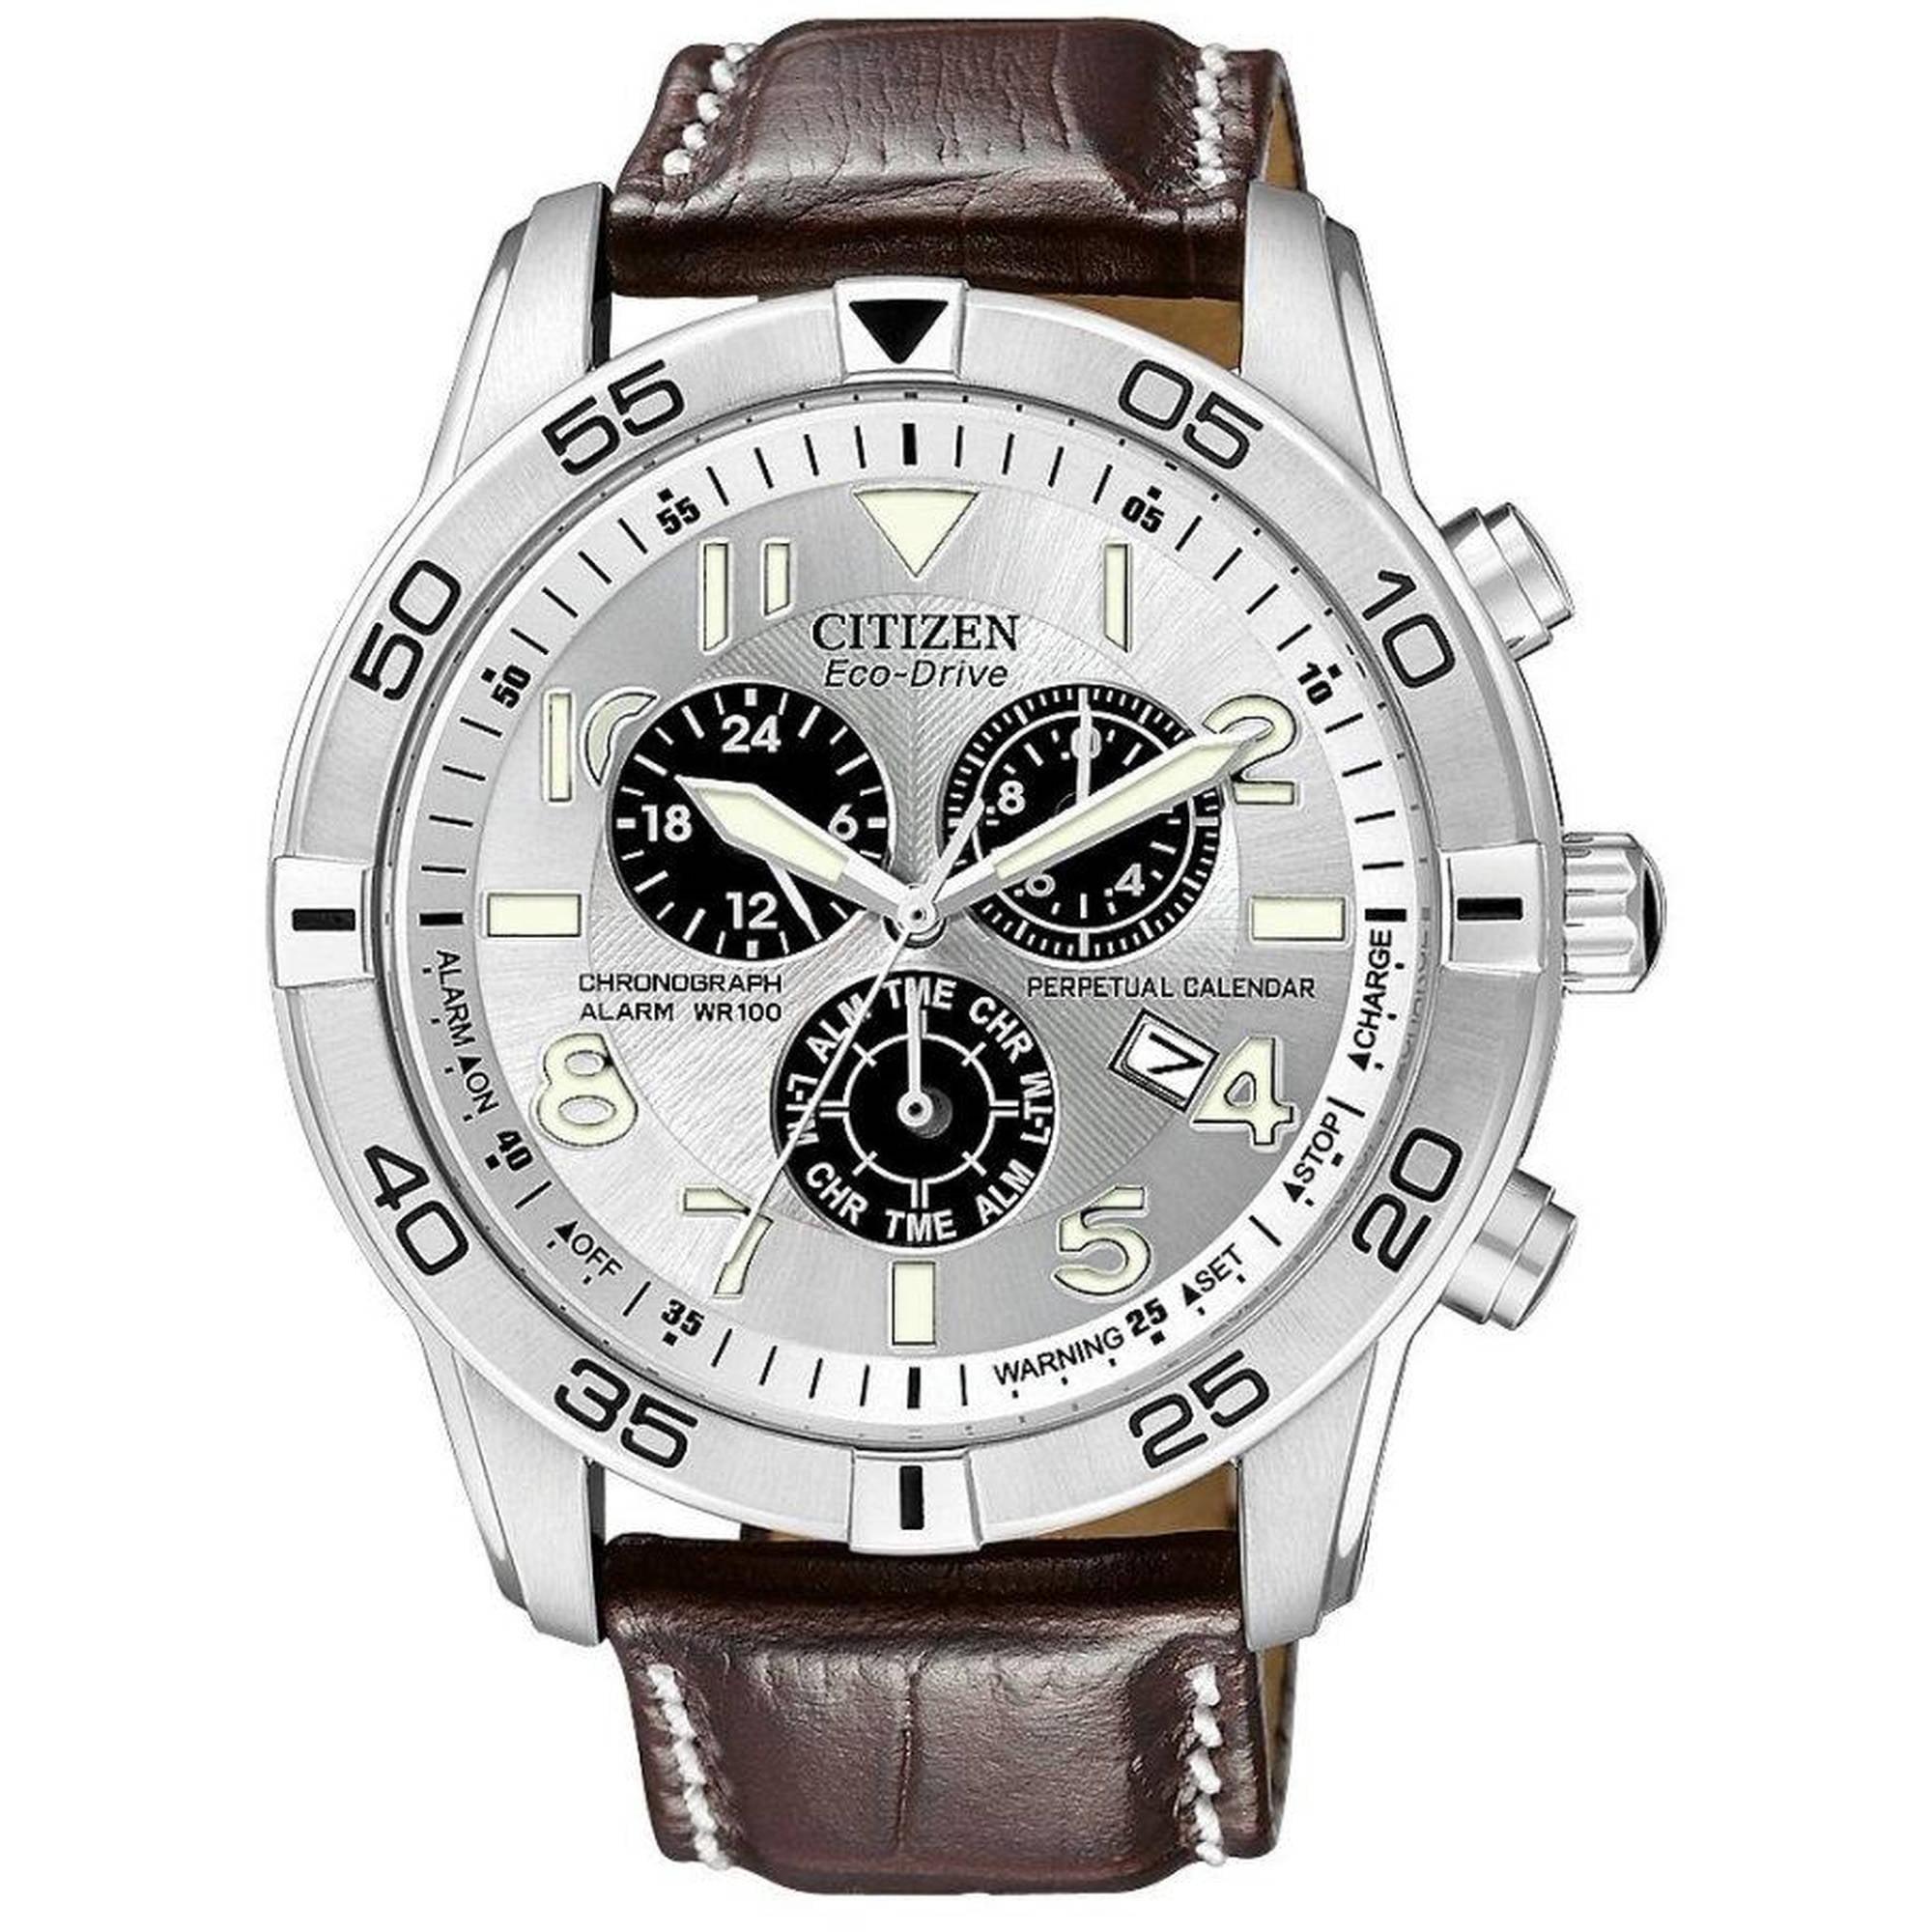 dbcc124941c CITIZEN - Citizen Eco-Drive Alarm Chronograph Perpetual Mens Watch  BL5470-06A - Walmart.com